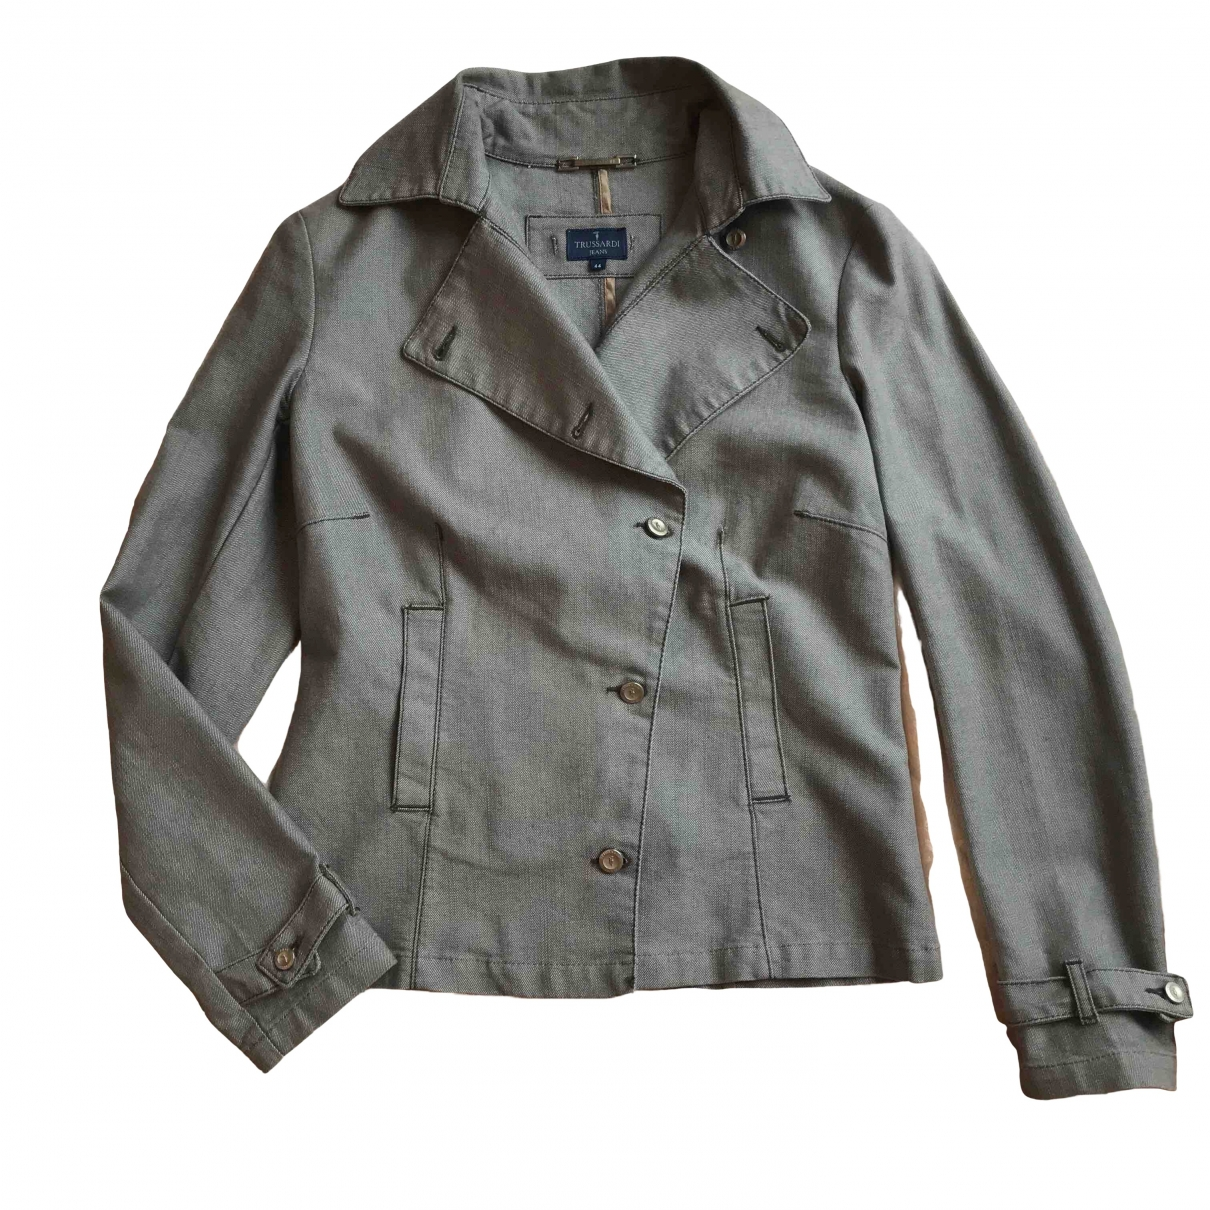 Trussardi Jeans \N Jacke in  Grau Denim - Jeans